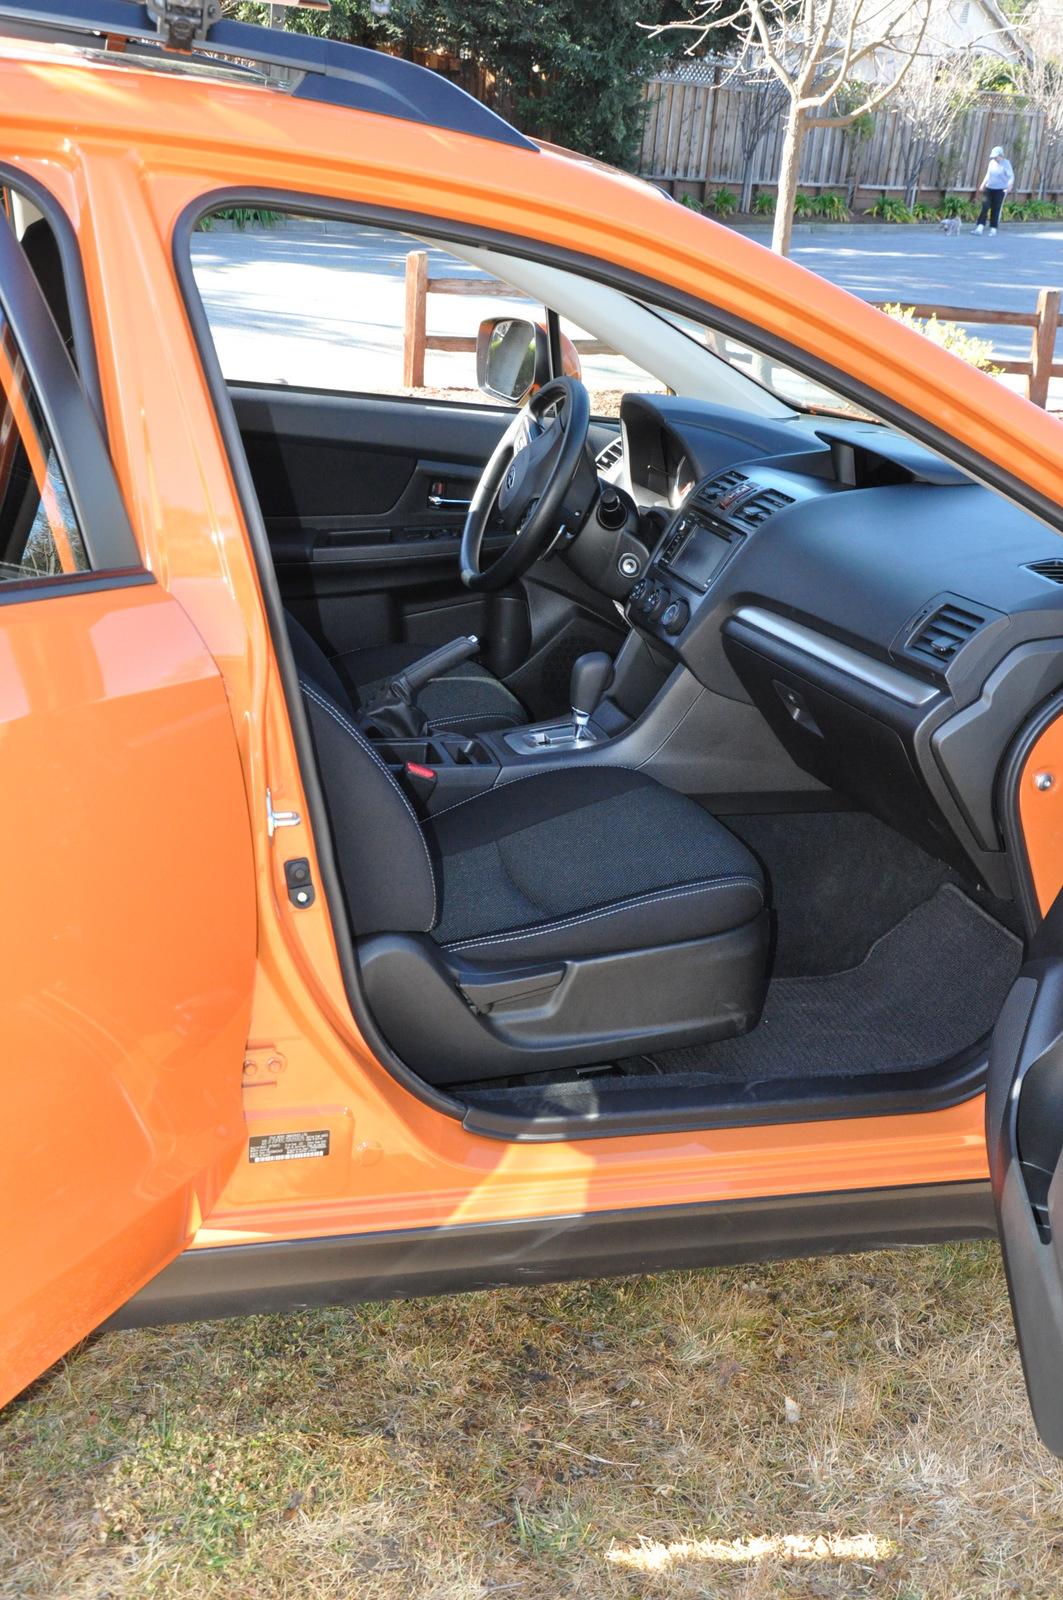 Subaru XV Crosstrek front passenger seat